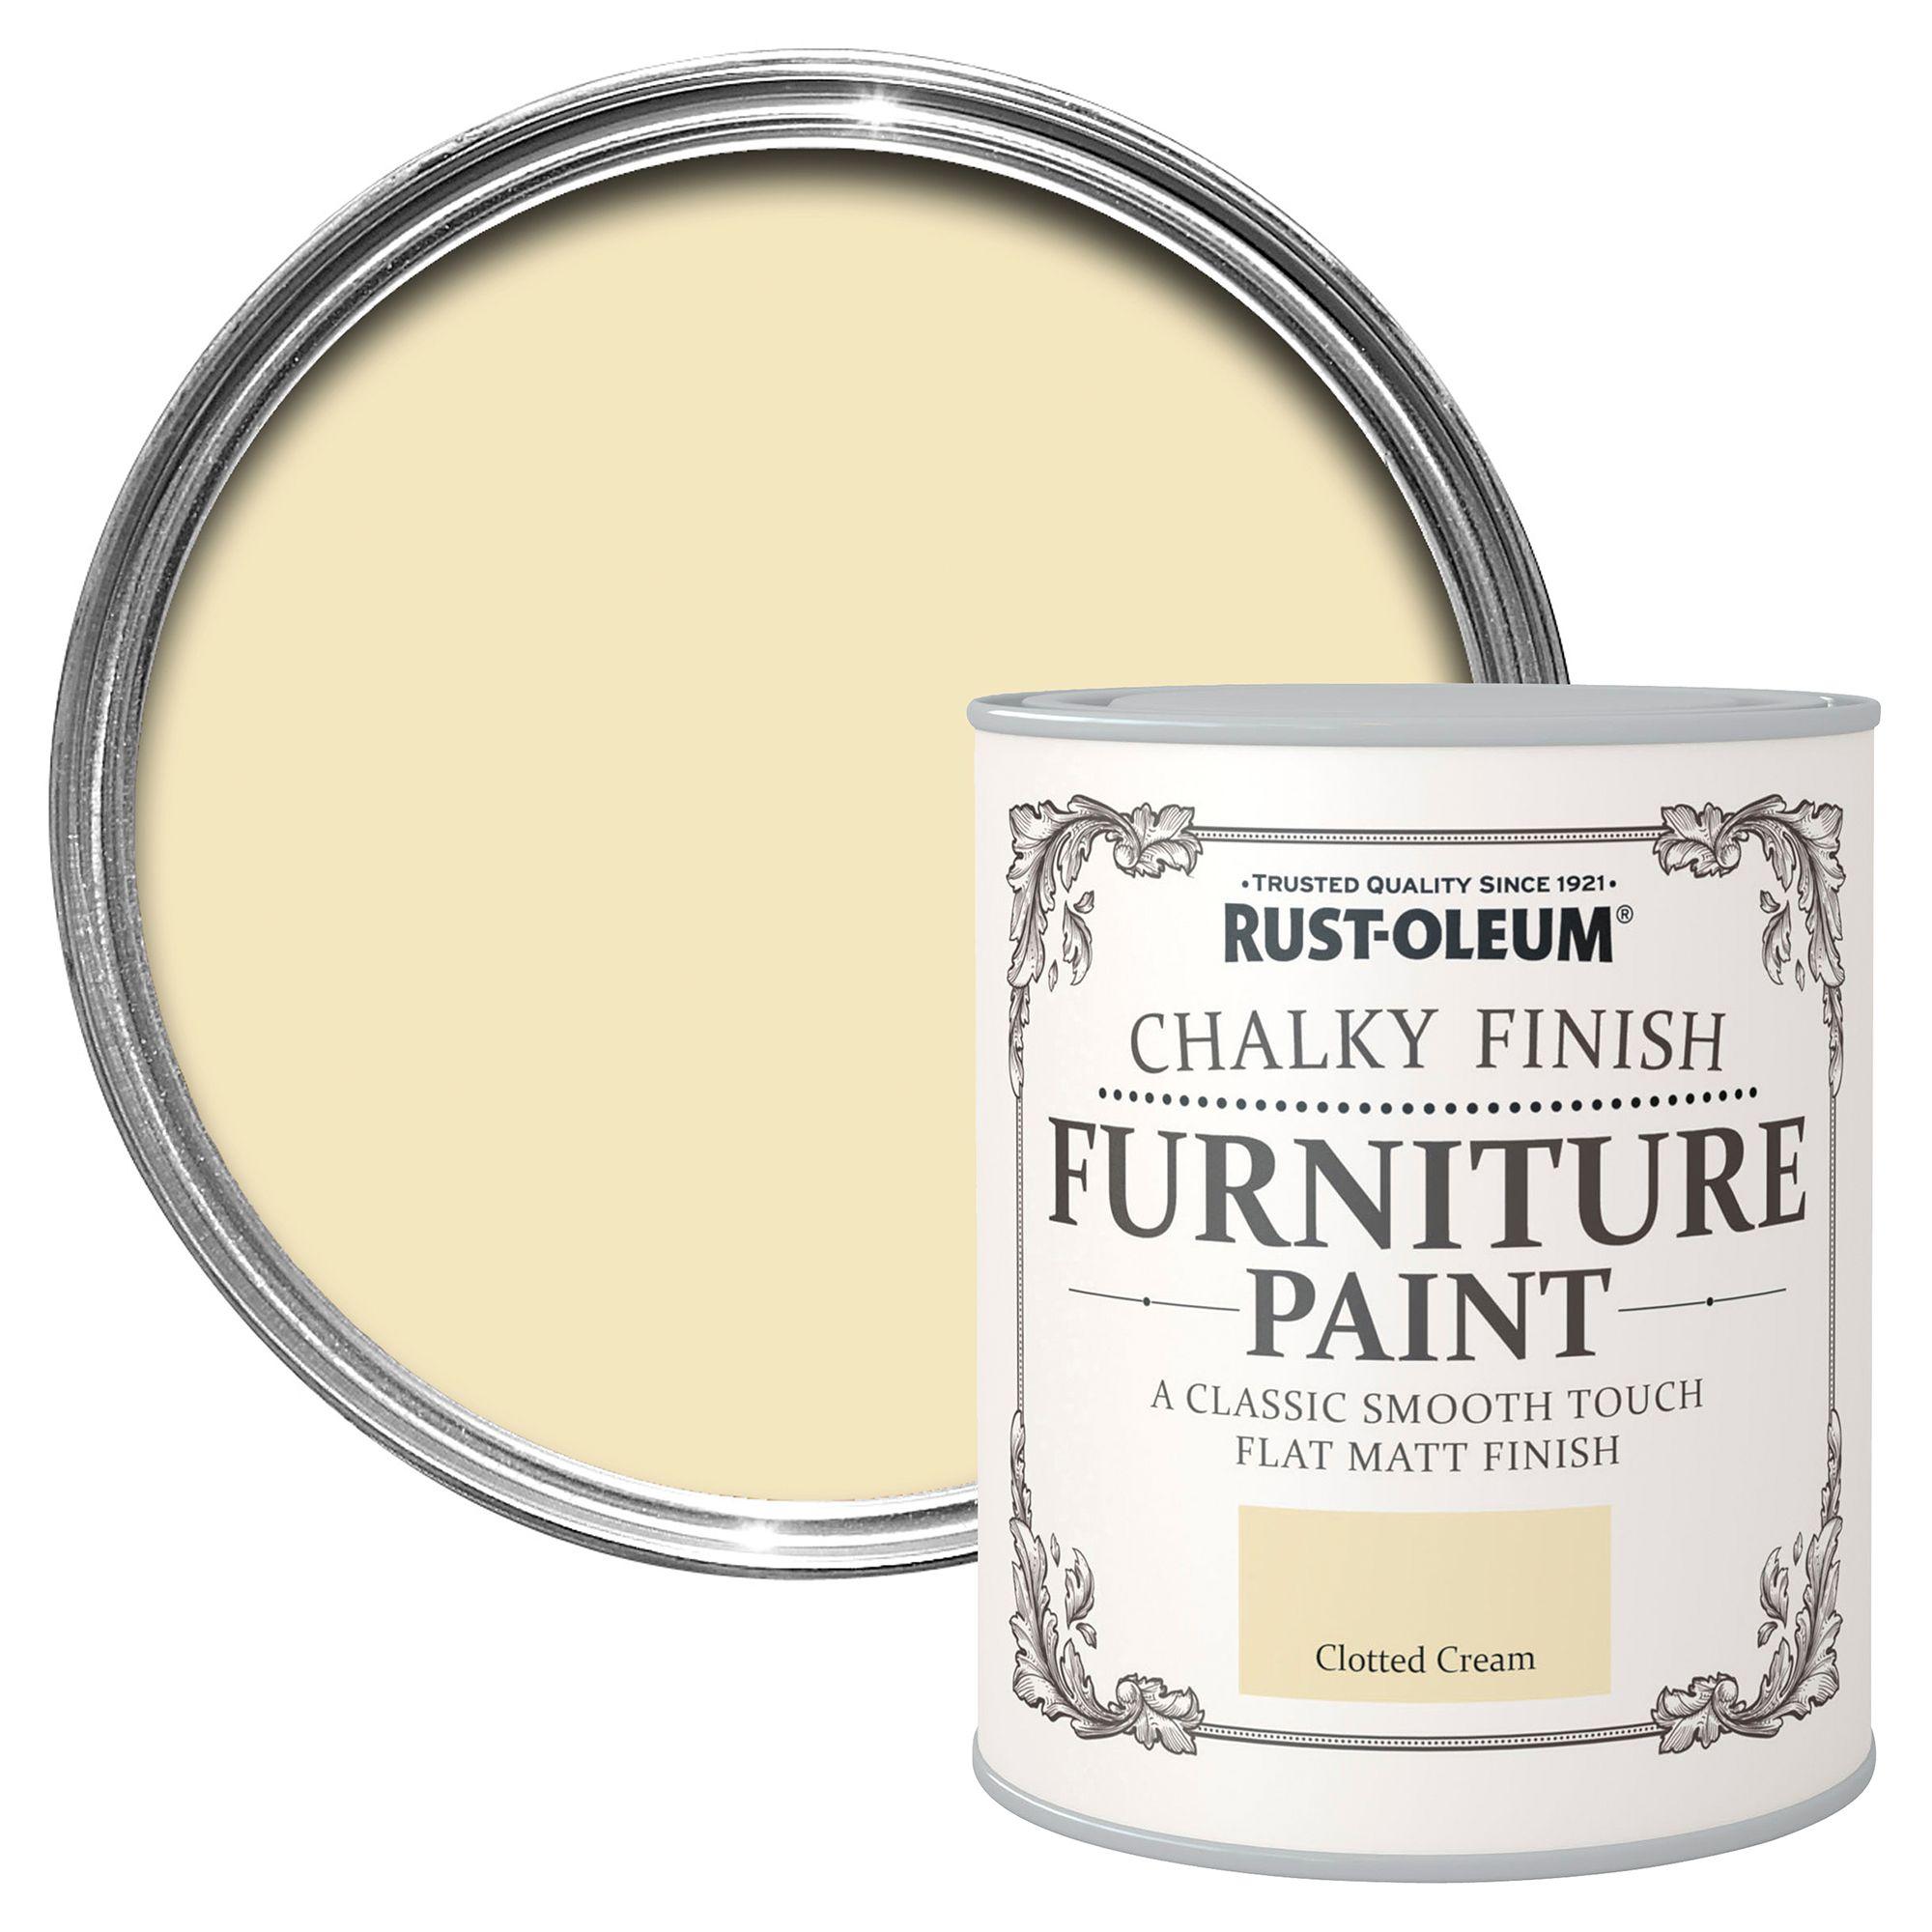 rustoleum-chalky-finish-furniture-paint